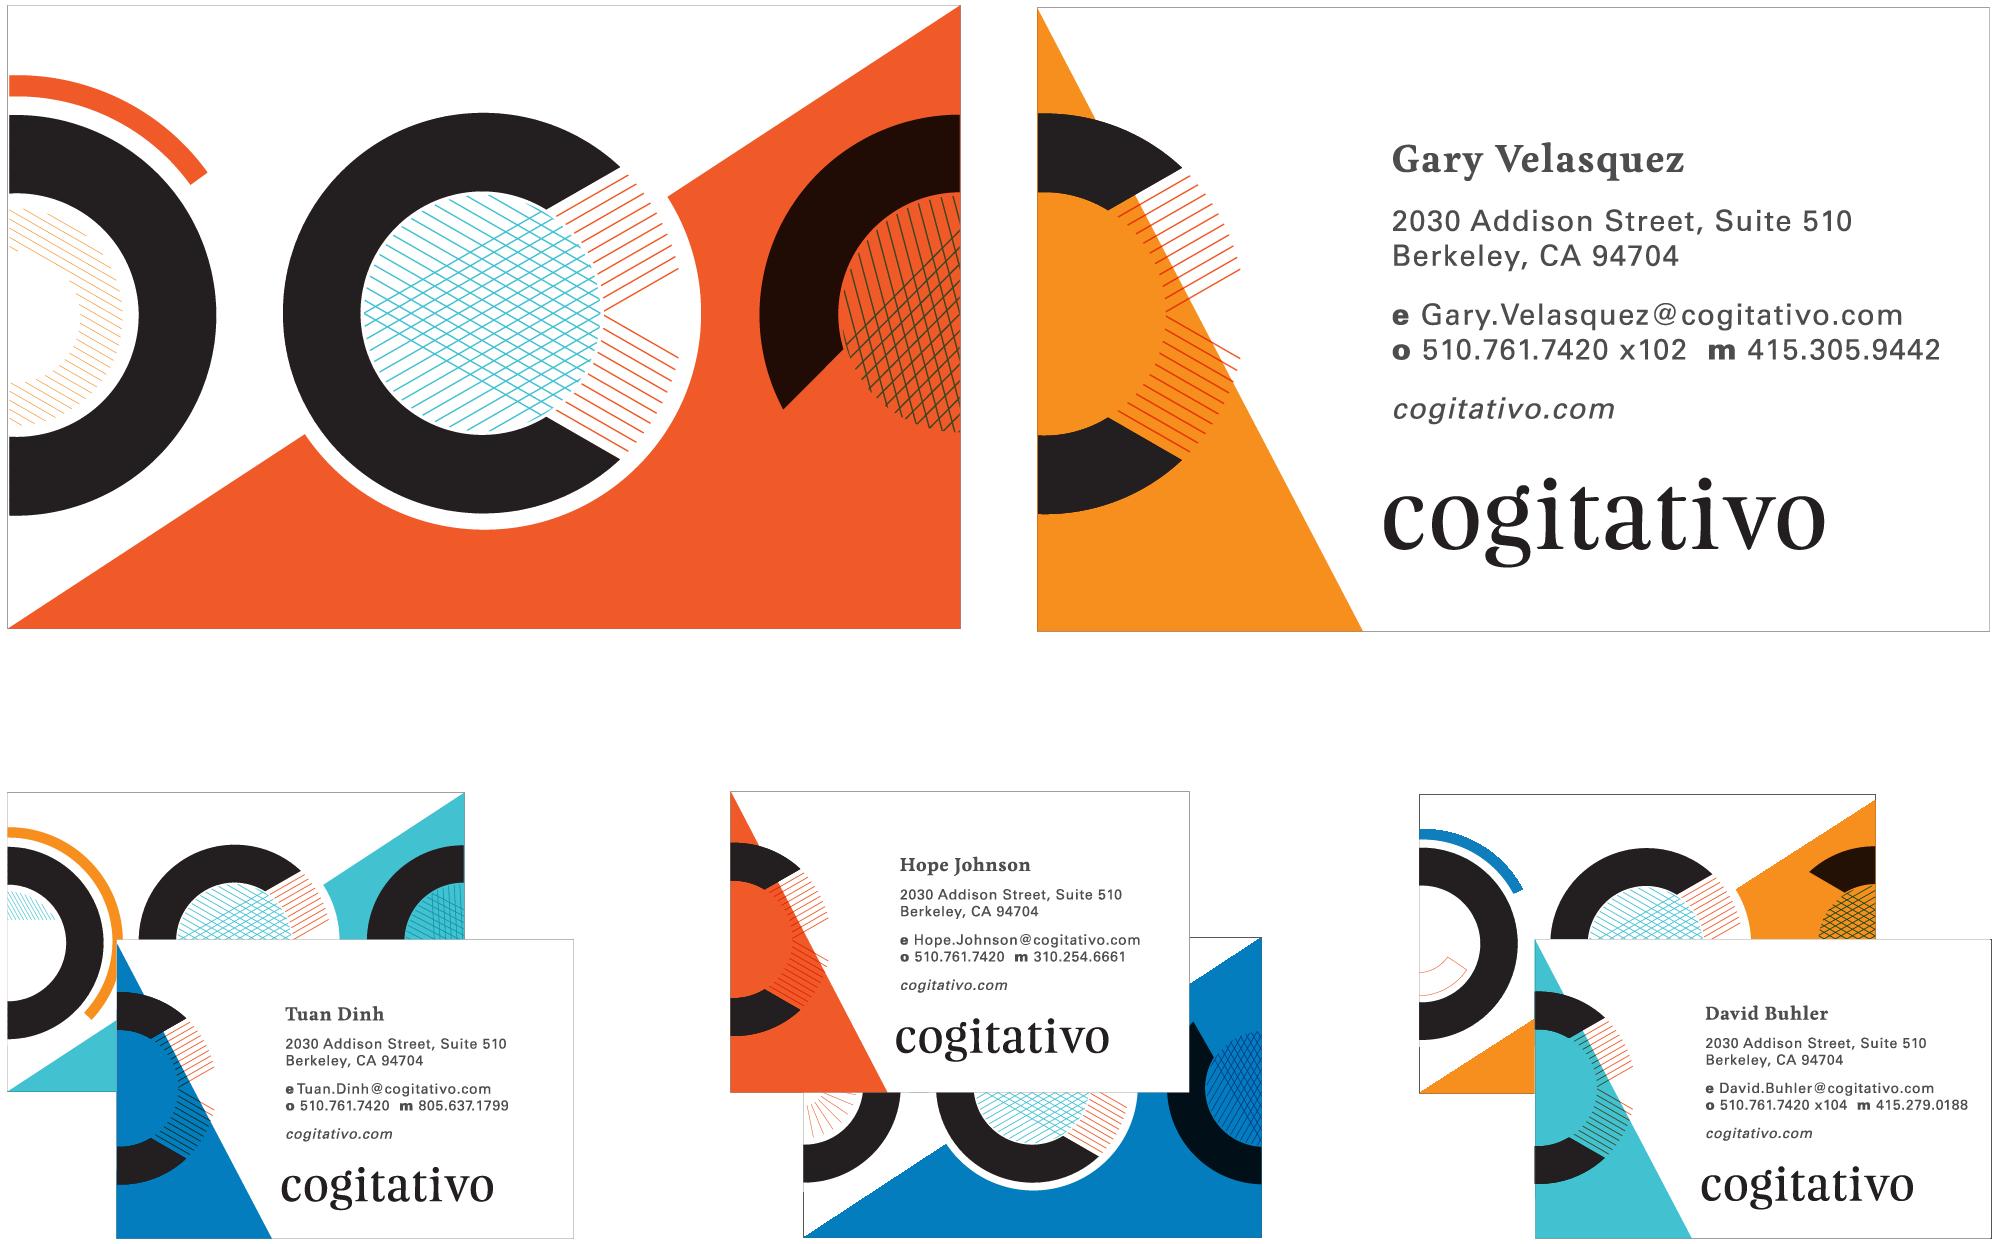 cogitativo_businesscards_kellygreen.png